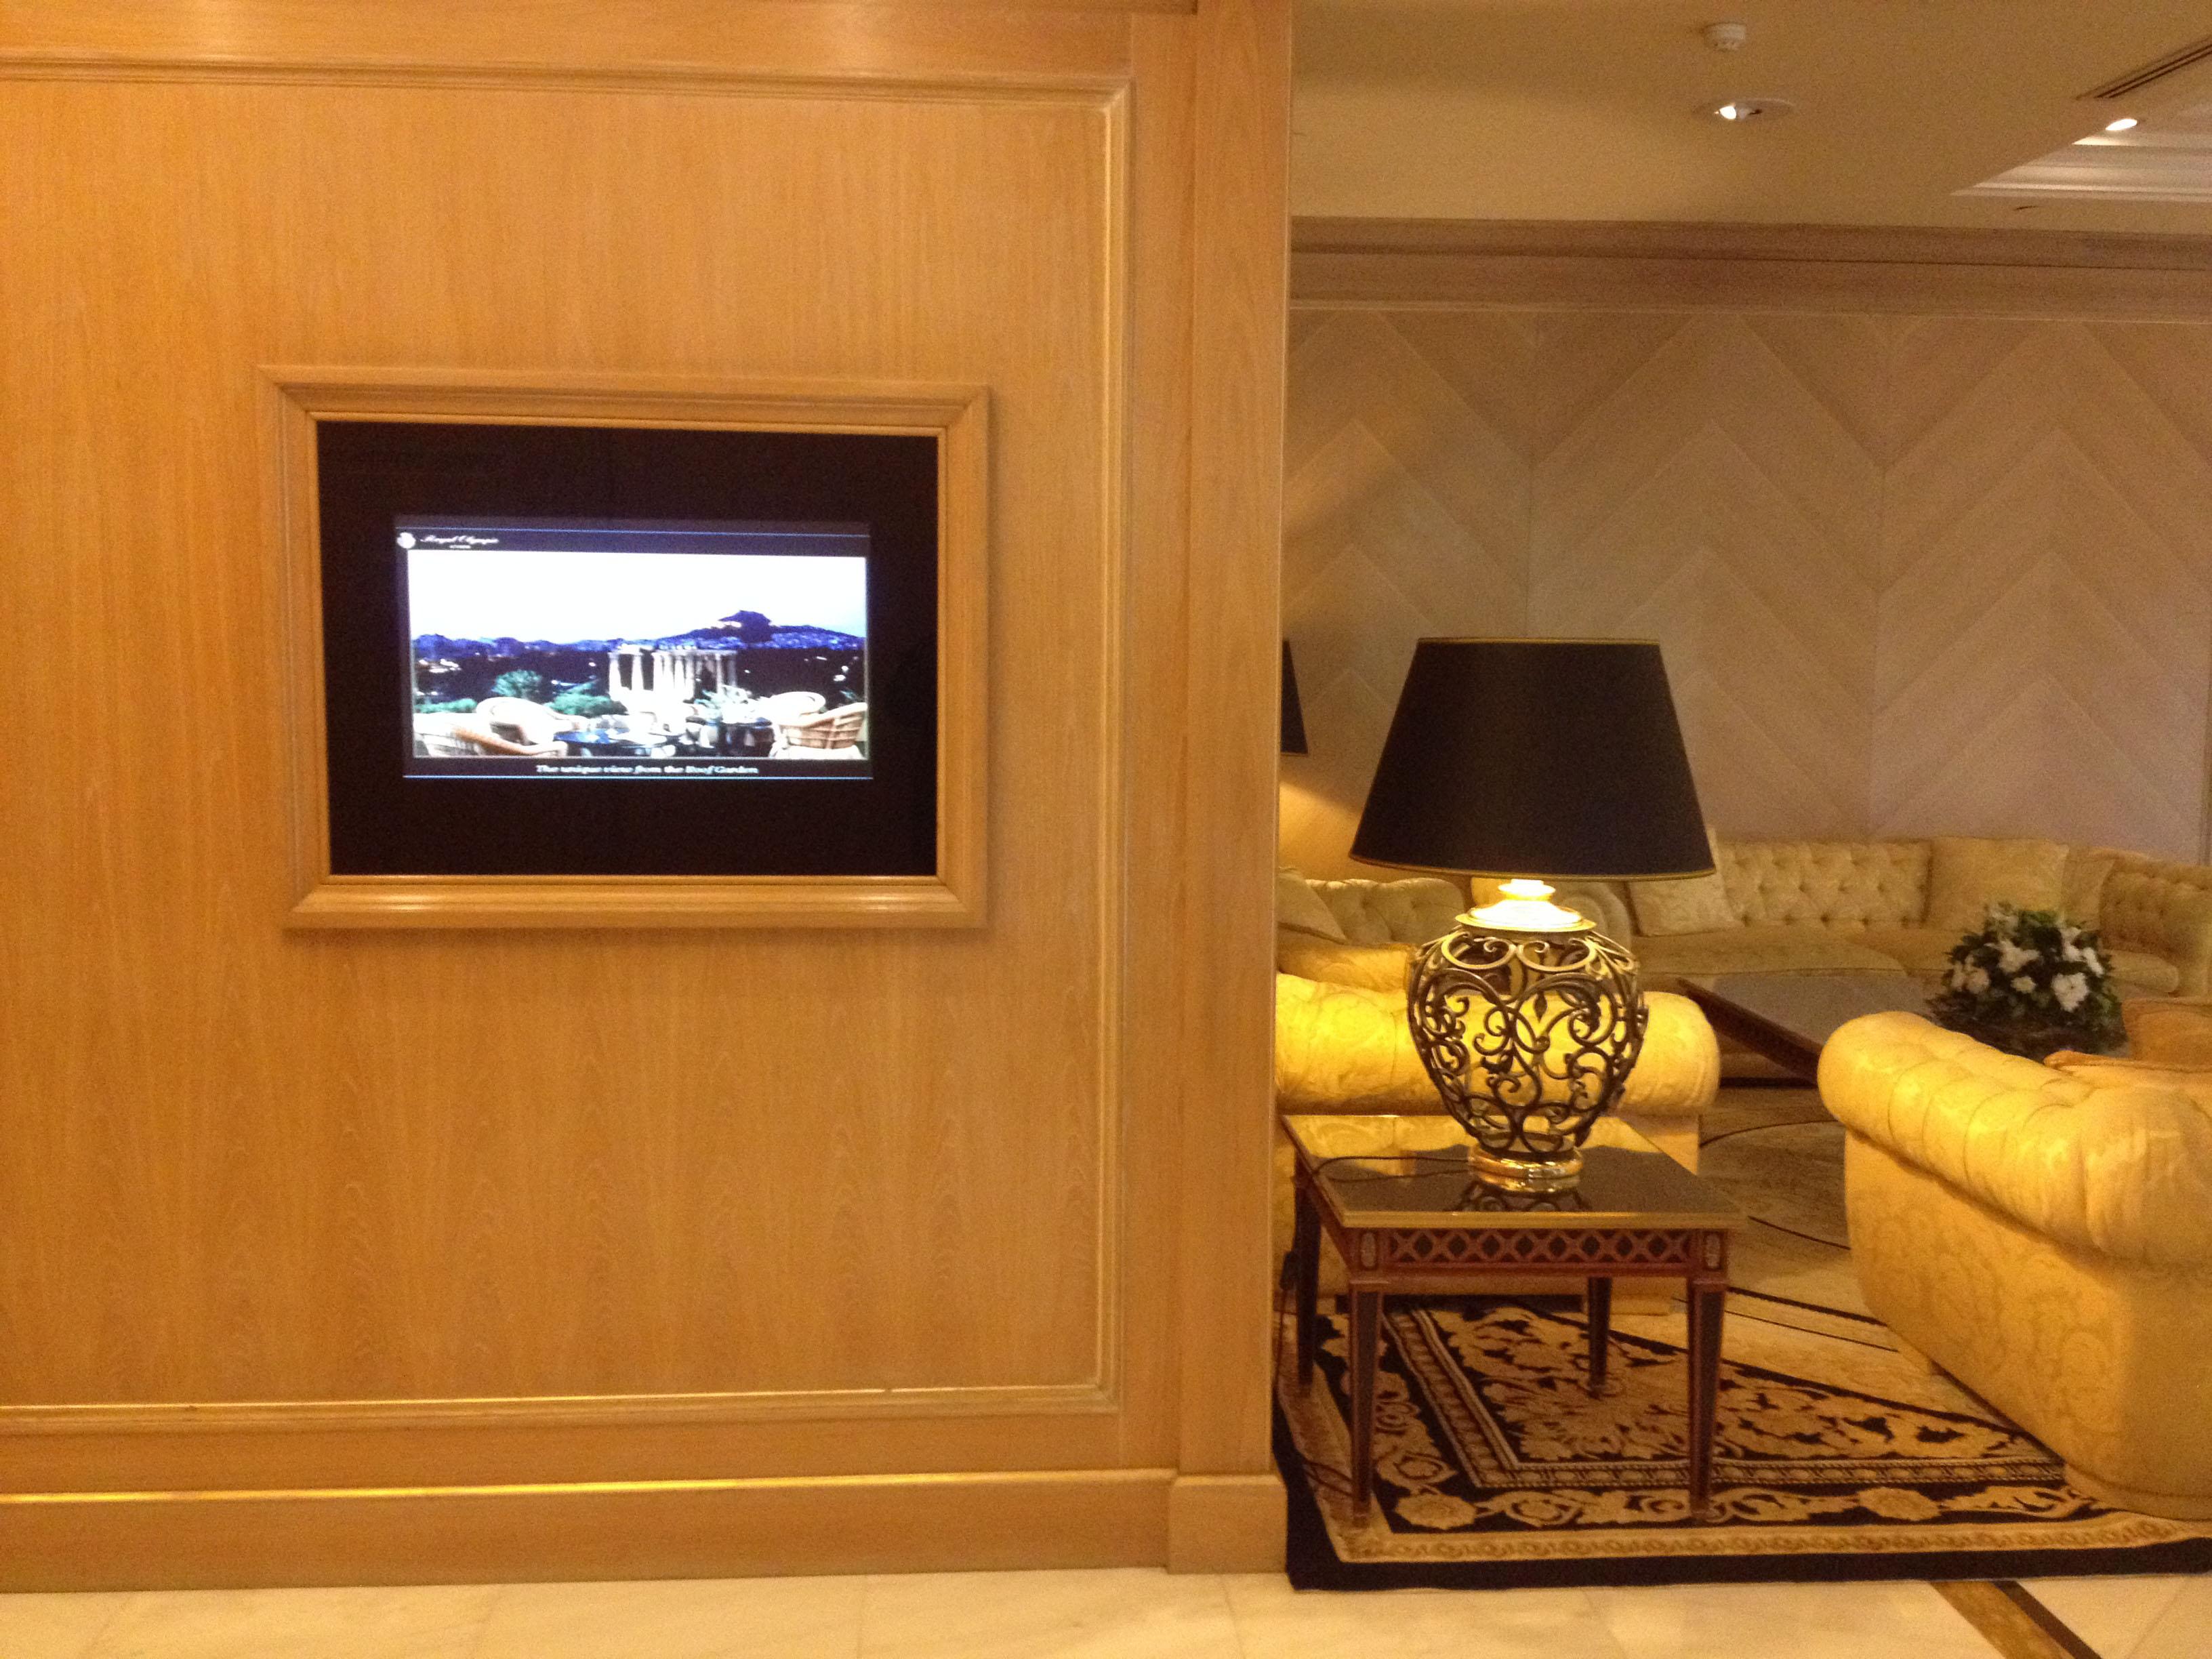 mirror tv hotel lobby